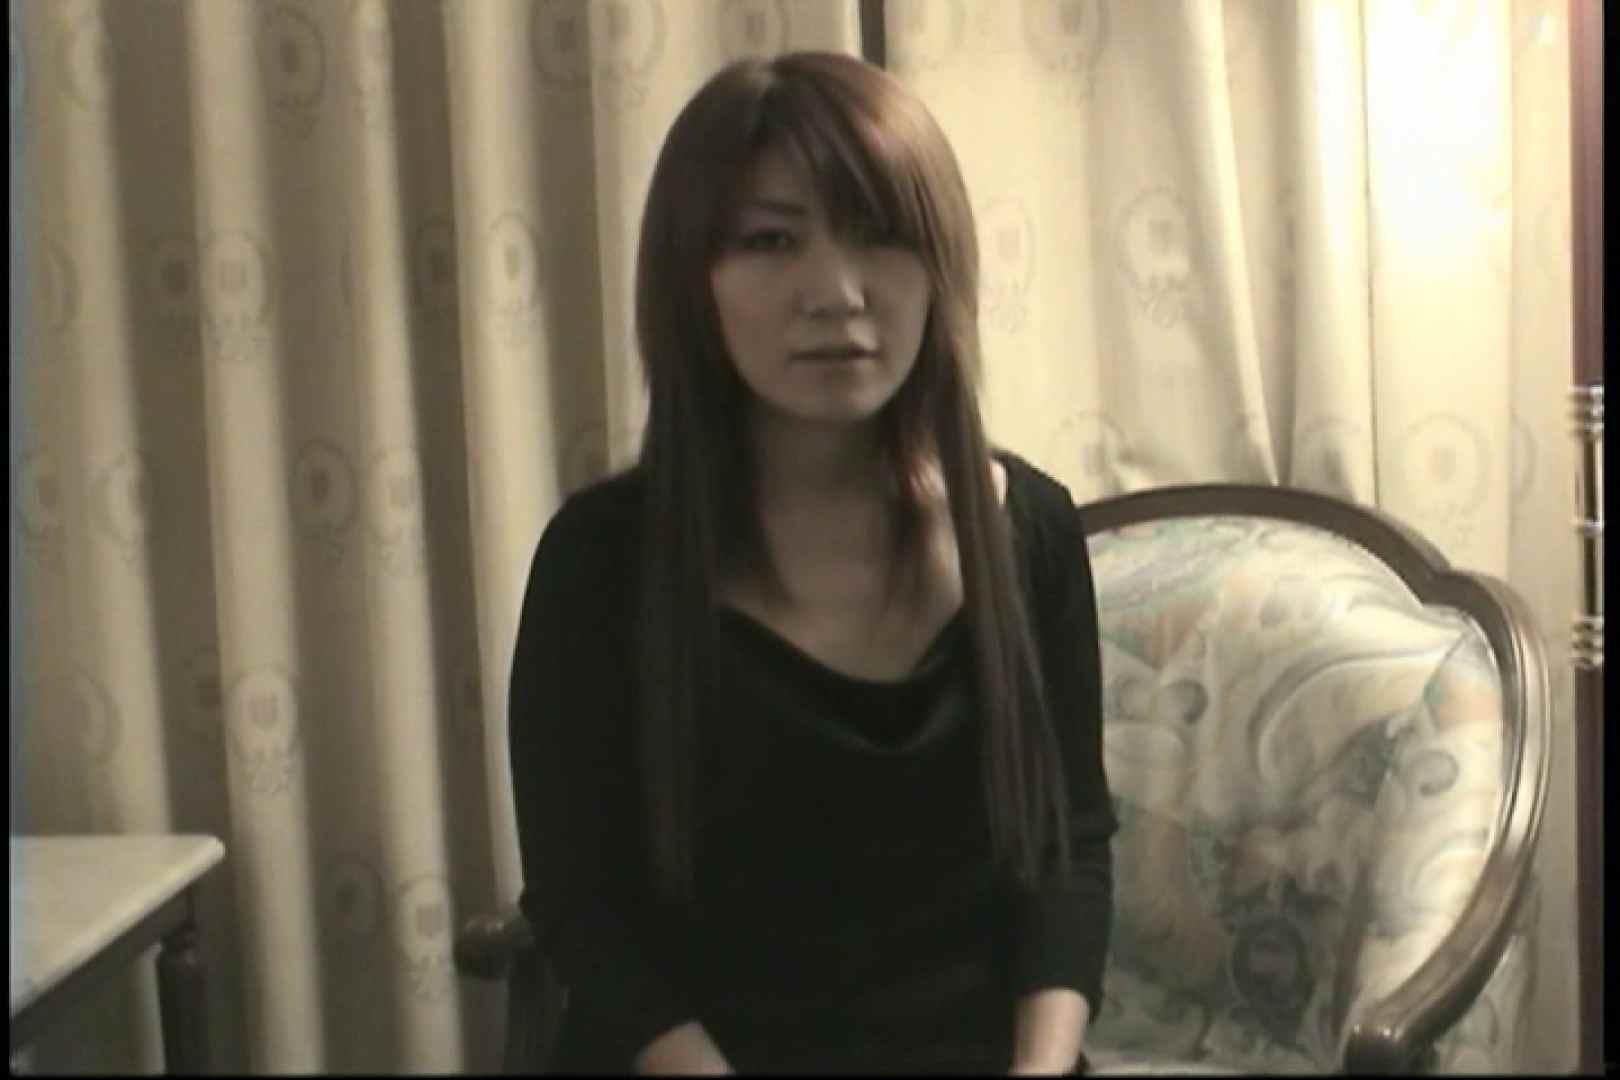 H大好きな清楚系の美ボディお姉さんとホテルでSEX~安西みか~ ホテル エロ画像 74連発 7